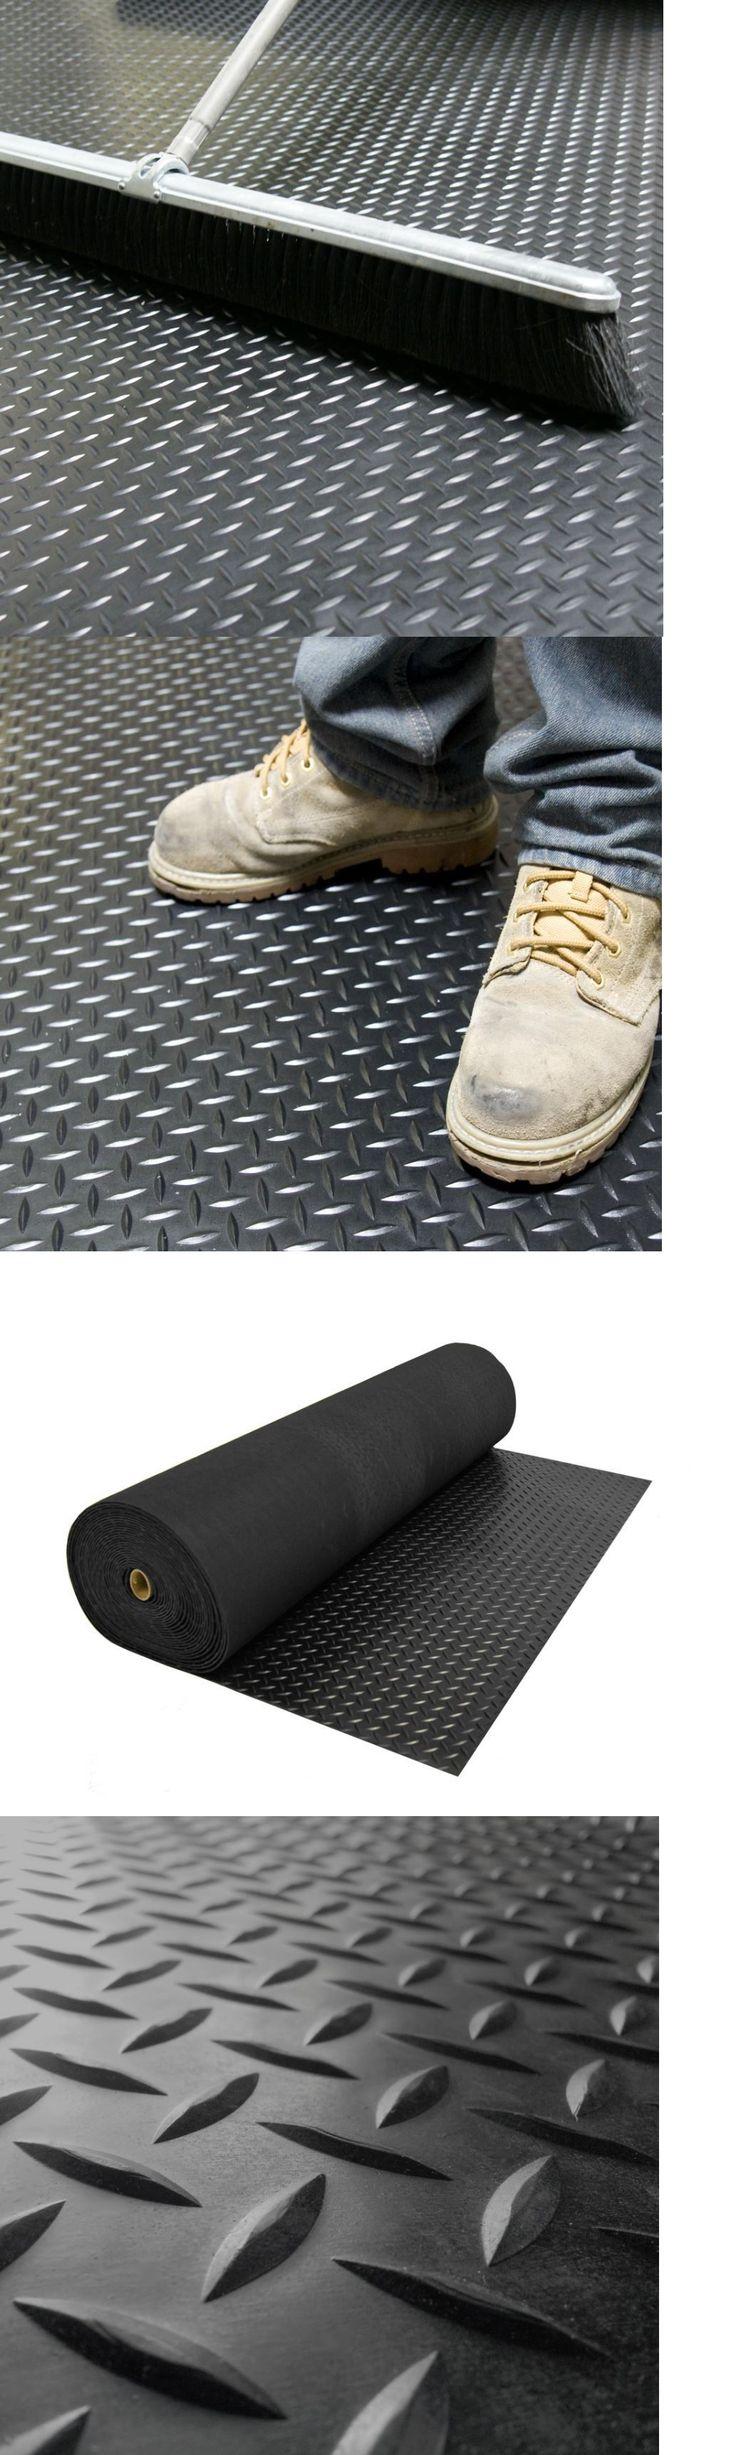 Yamaha rhino rubber floor mats - Equipment Mats And Flooring 179806 Garage Floor Protector Rubber Flooring For Home Gym Black Diamond